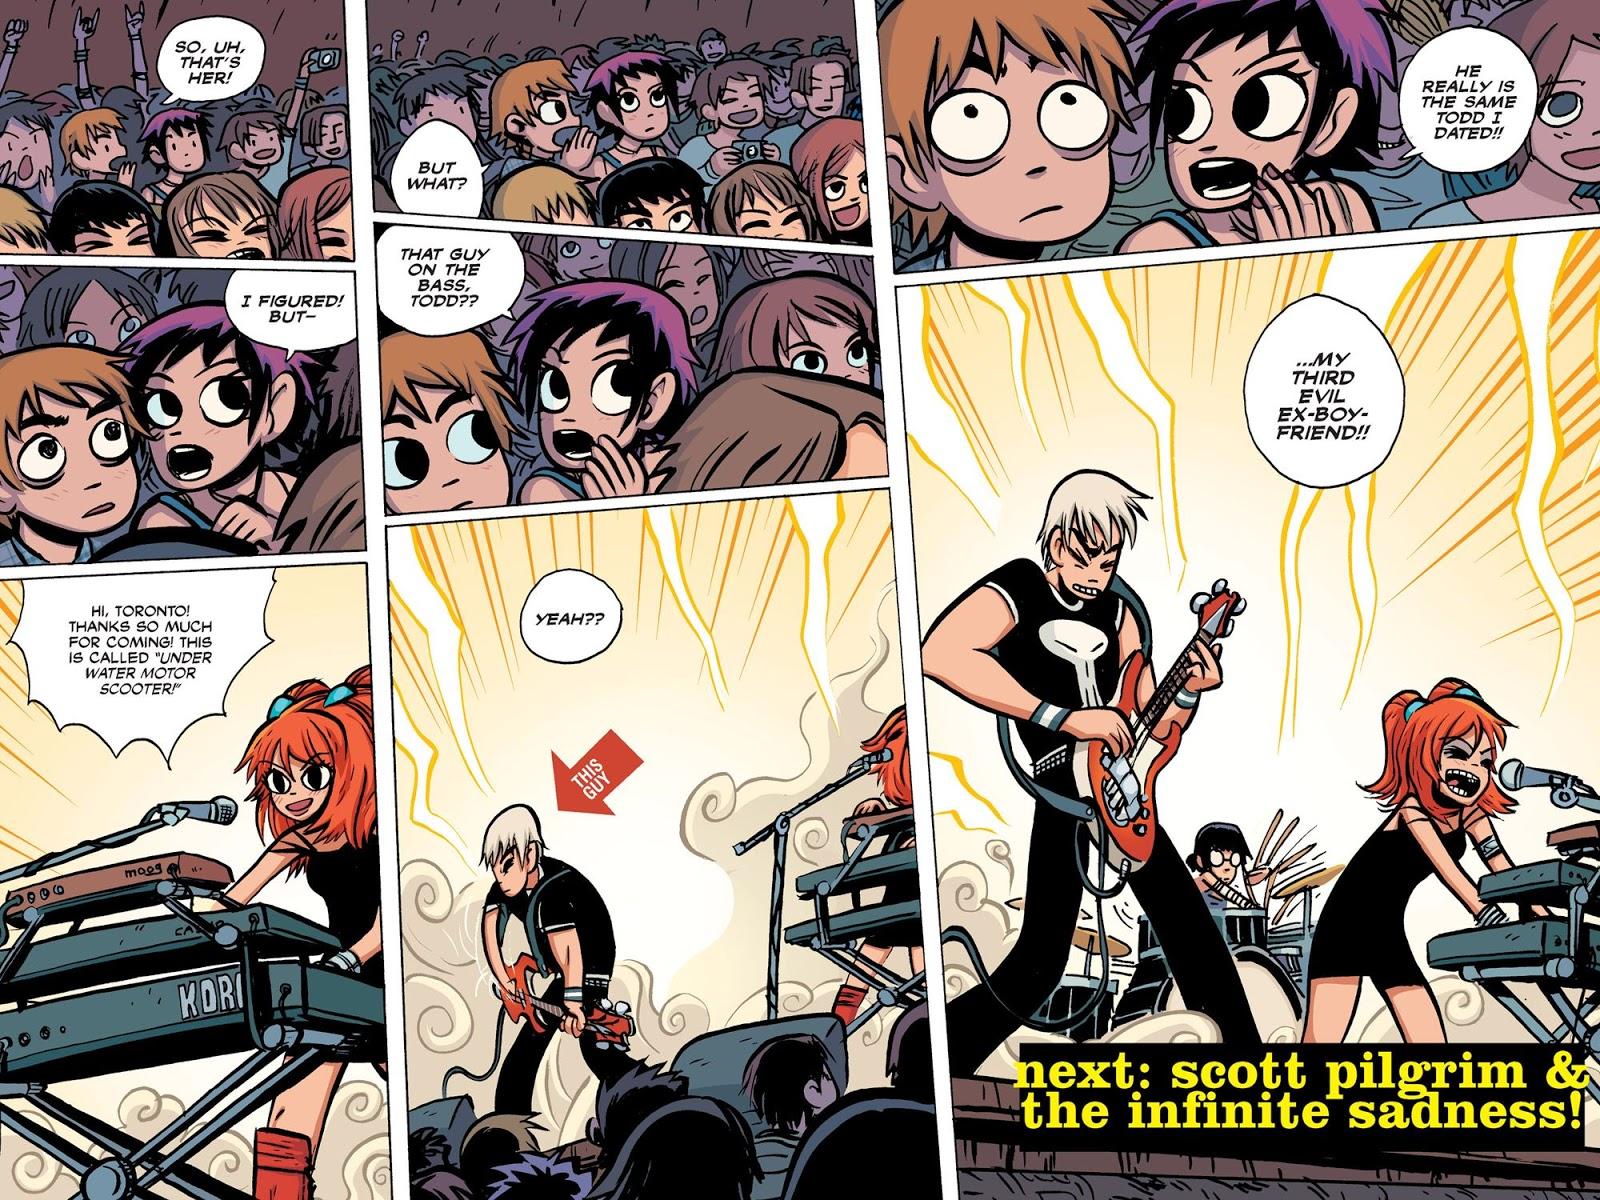 scott pilgrim viewcomic reading comics online for free